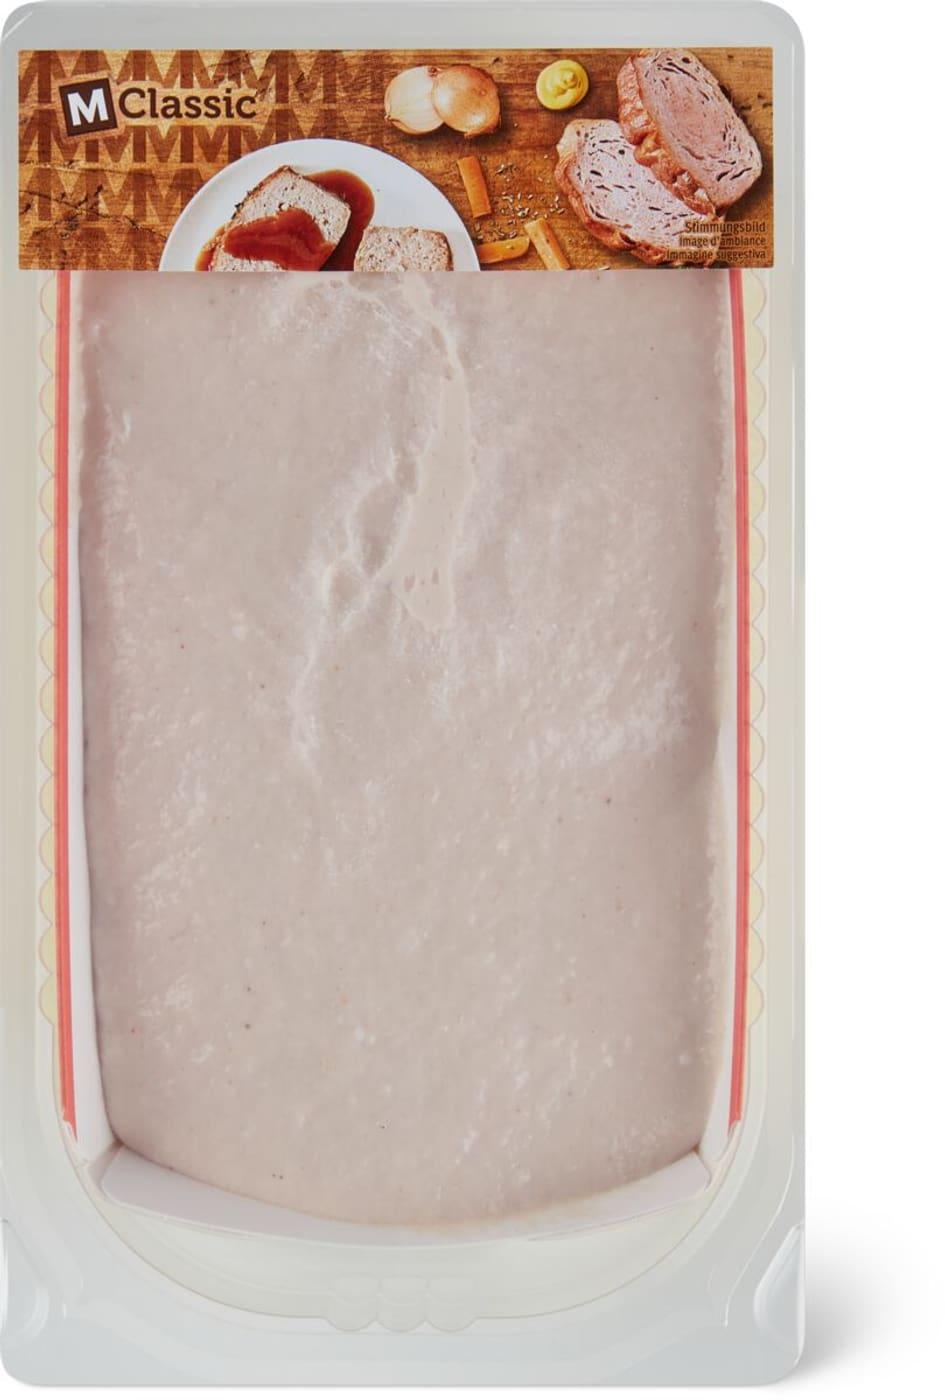 Wieviel gebackener leberkäse pro person